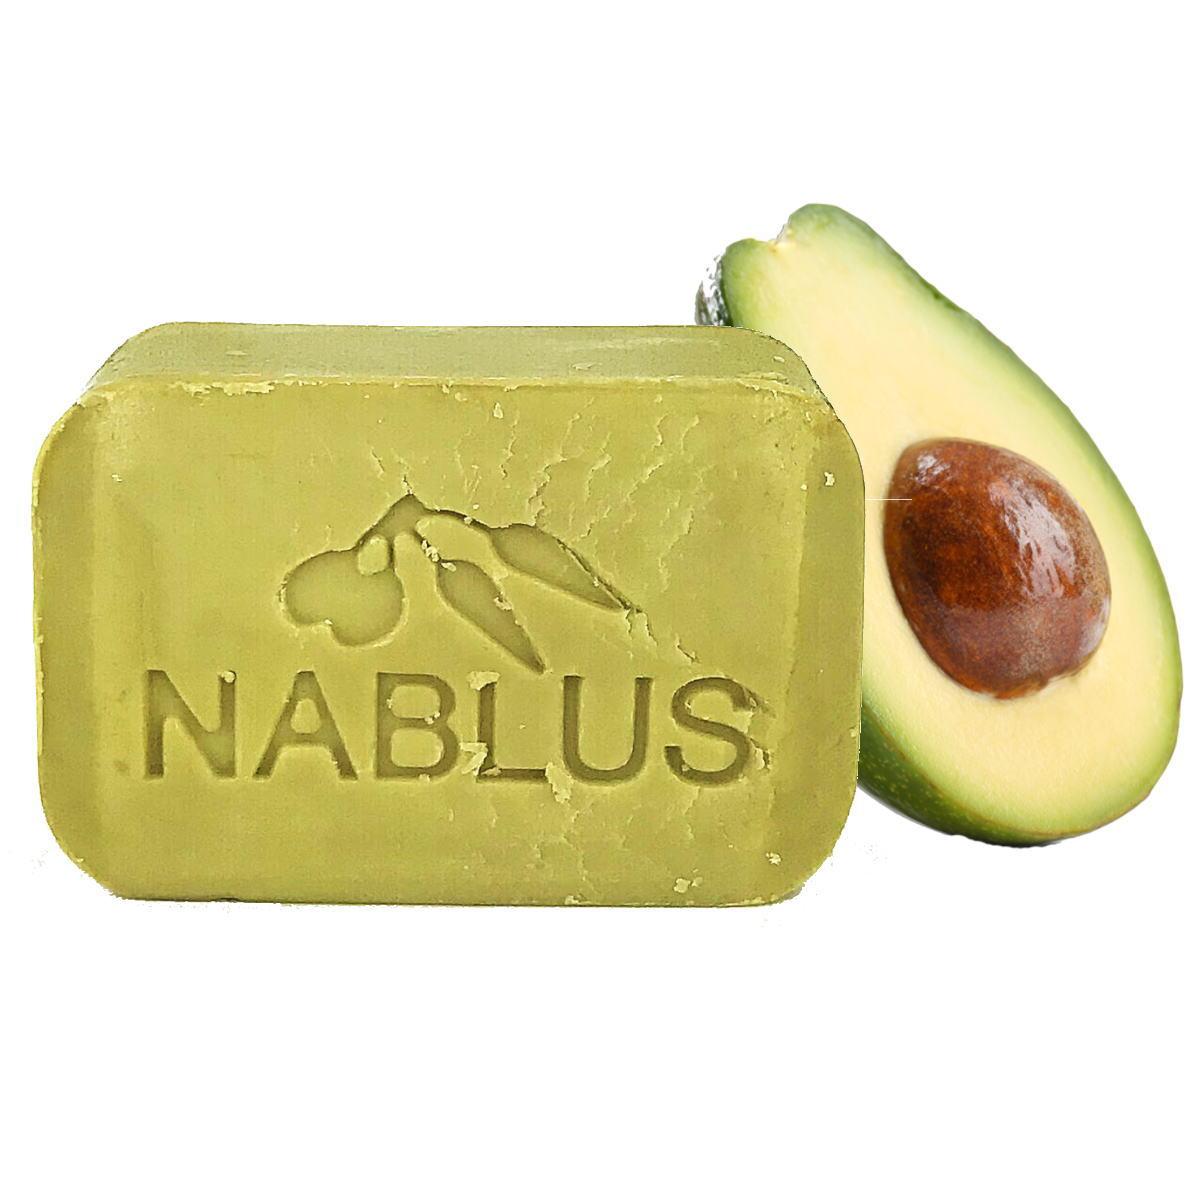 Nablus Soap ナーブルスソープ - アボカド - 無添加 オーガニック石鹸